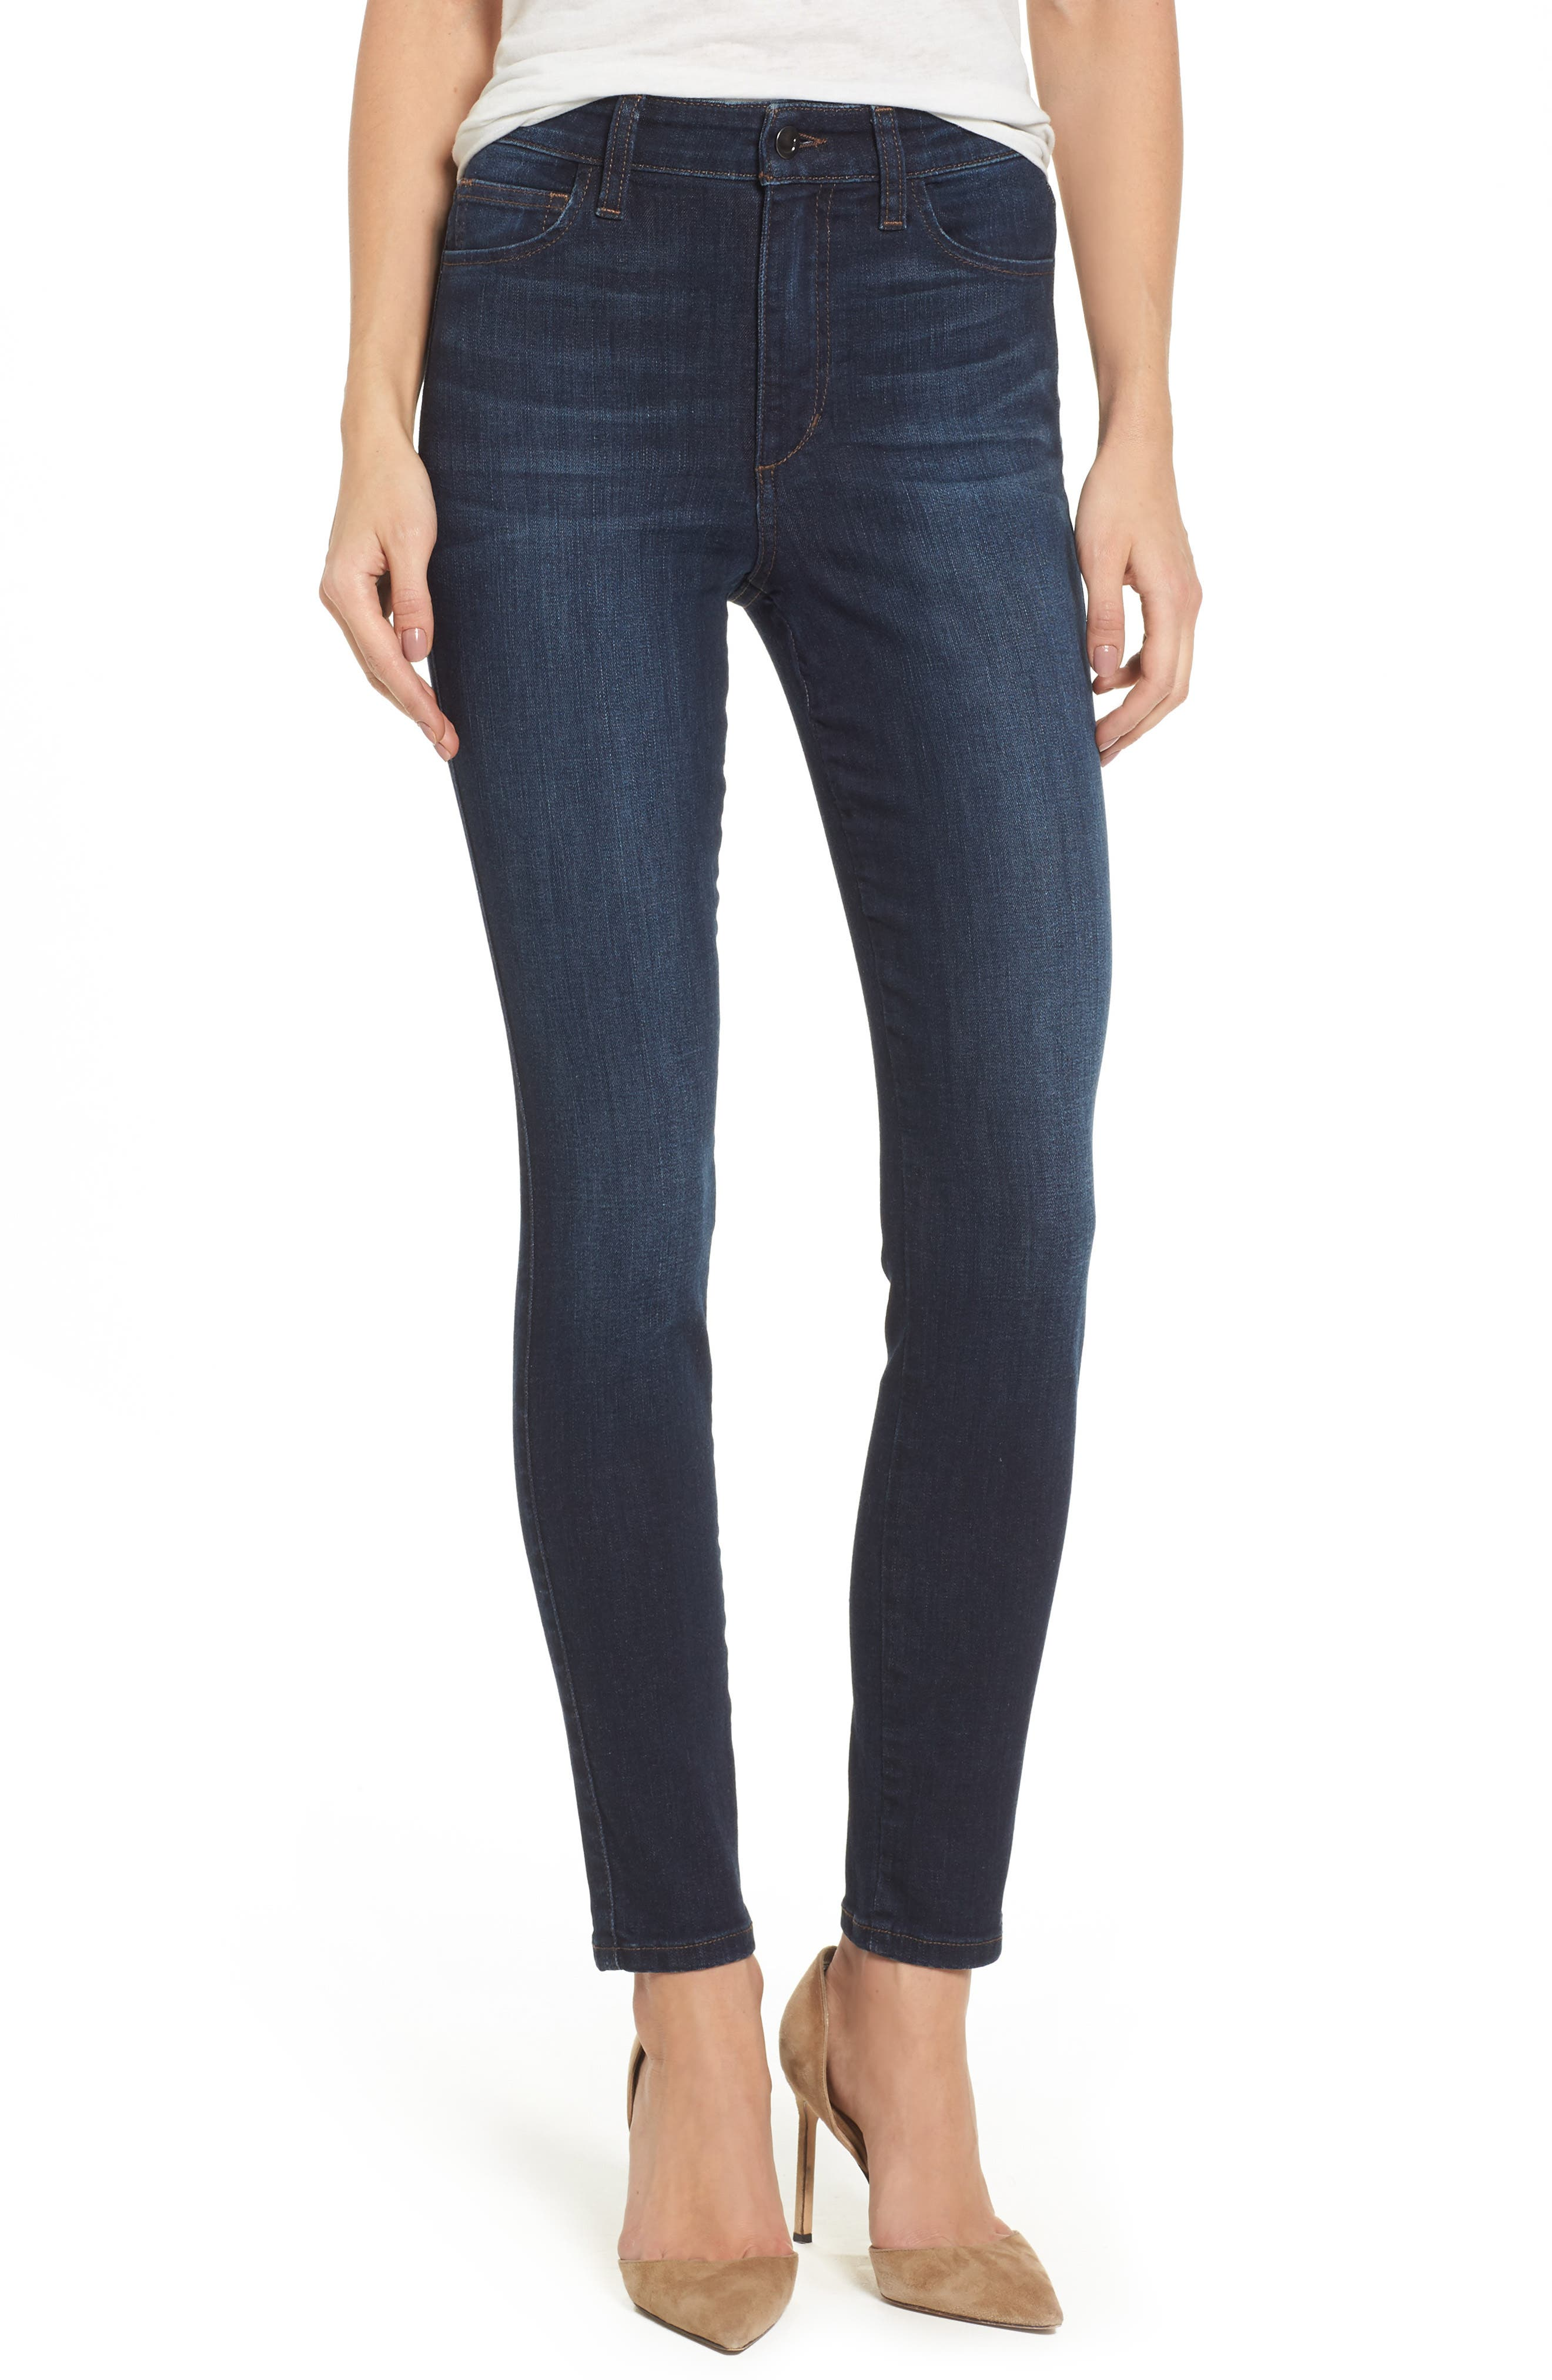 Charlie High Waist Skinny Jeans,                             Main thumbnail 1, color,                             Narissa